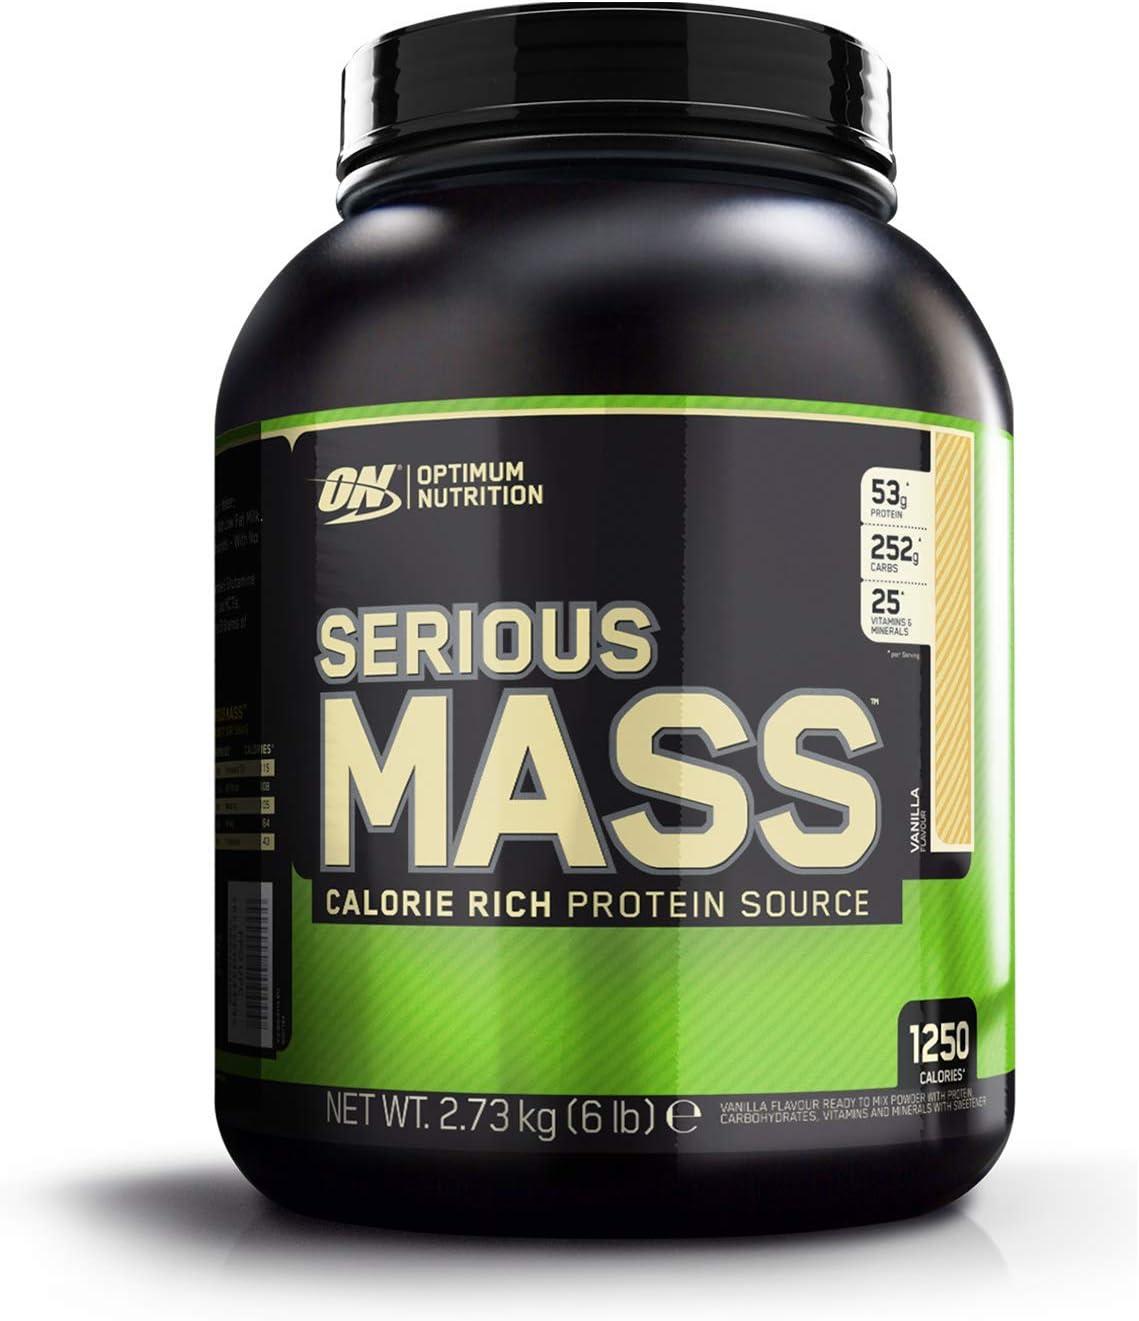 Optimum Nutrition ON Serious Mass proteina en polvo mass gainer alto en proteína, con vitaminas, creatina y glutamina, vainilla, 8 porciones, 2.73 kg